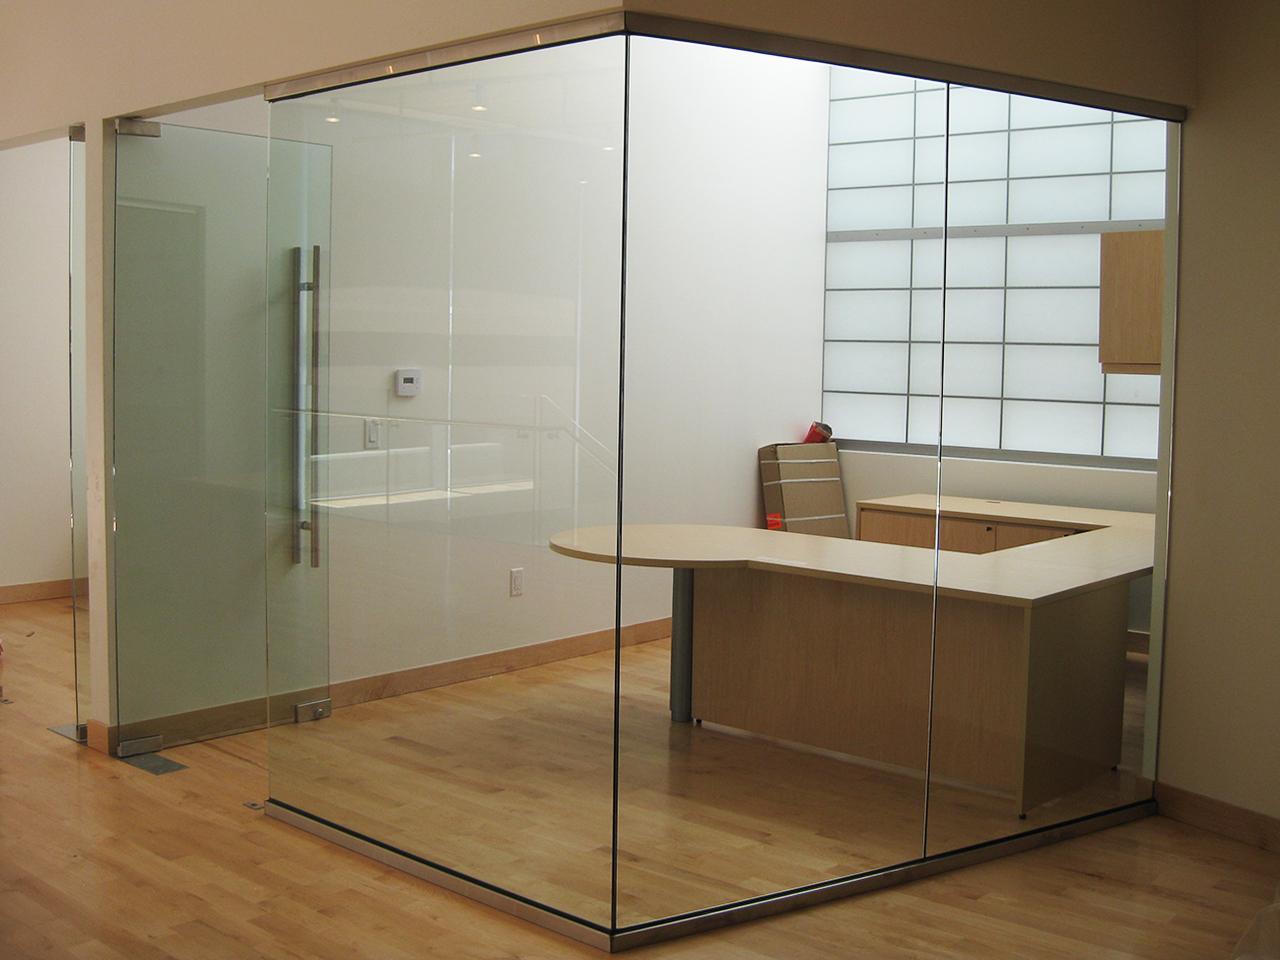 односторонняя перегородка из стекла